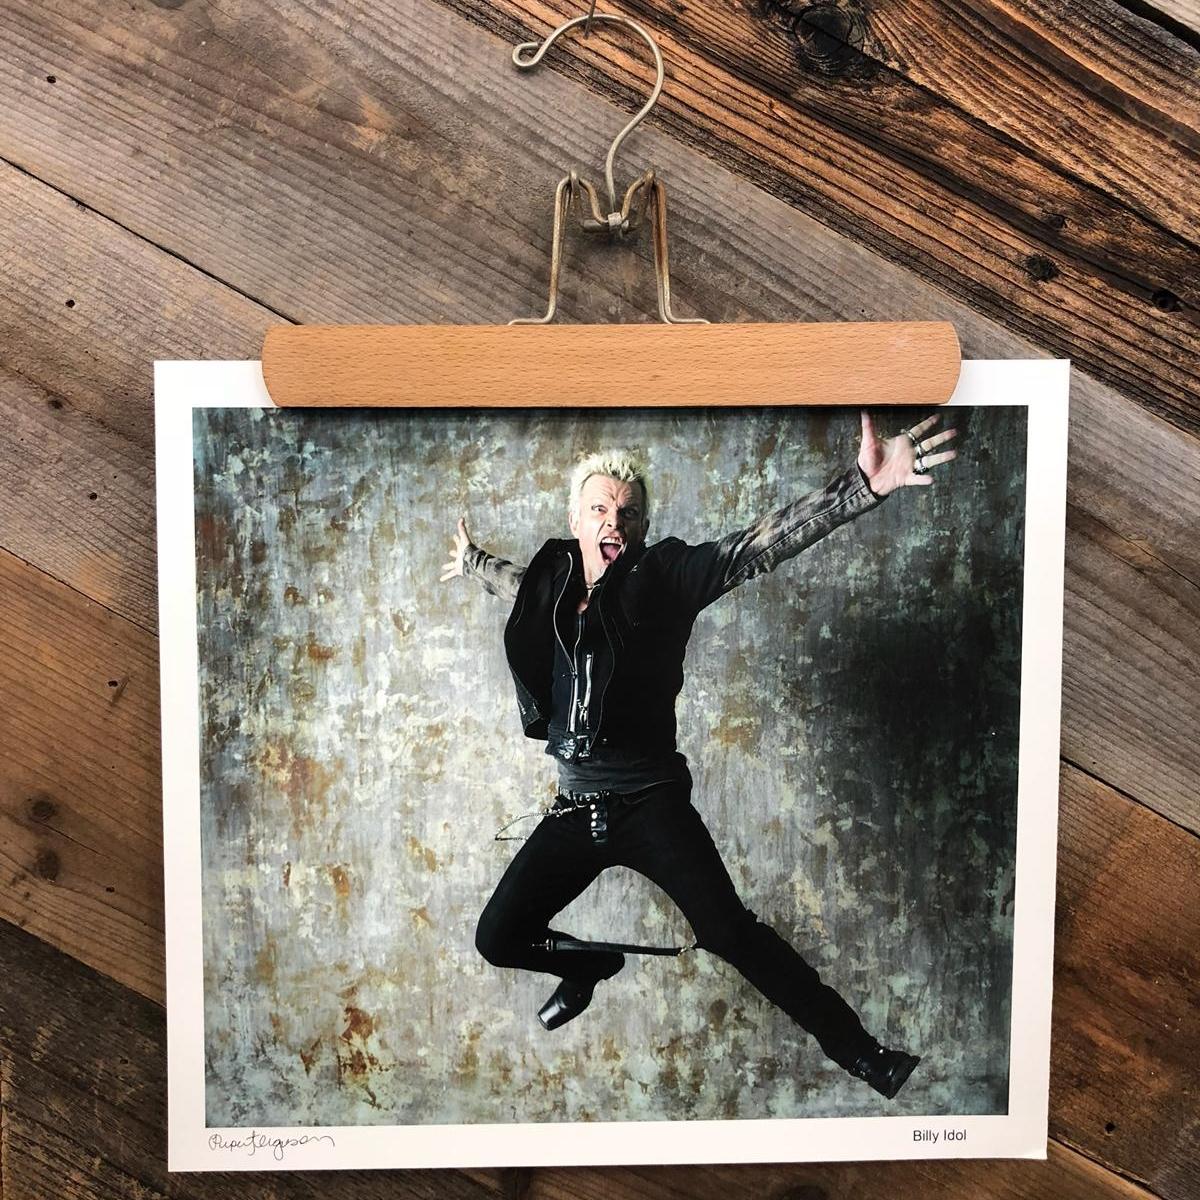 Billy Idol Photo Print